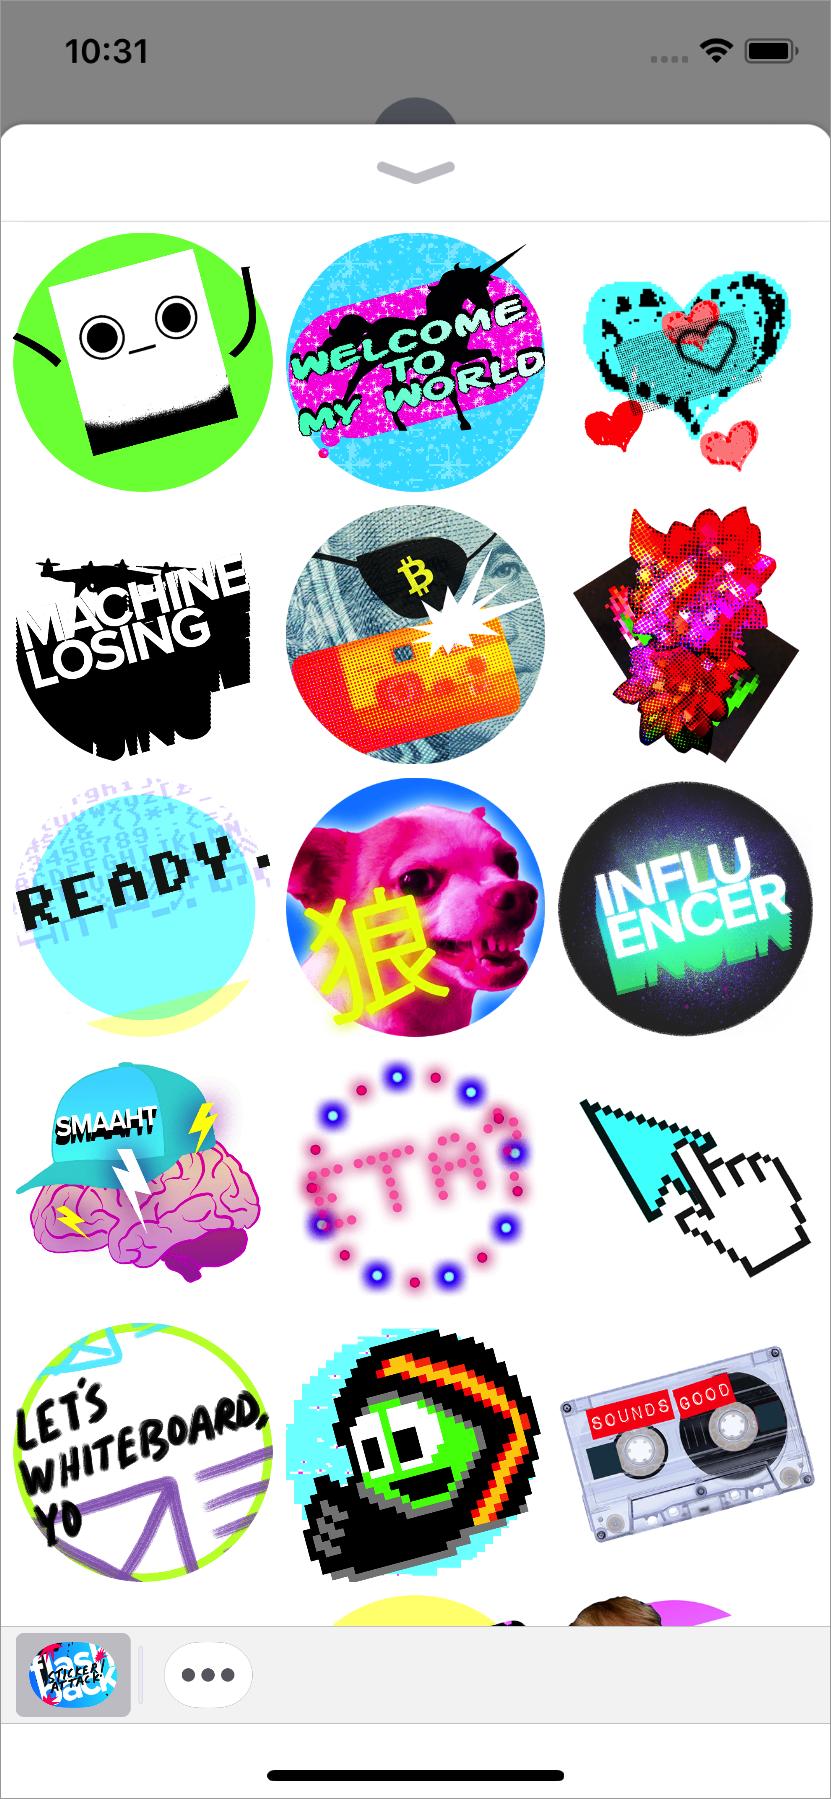 Flashback-Sticker-Attack-iMessage-03.png